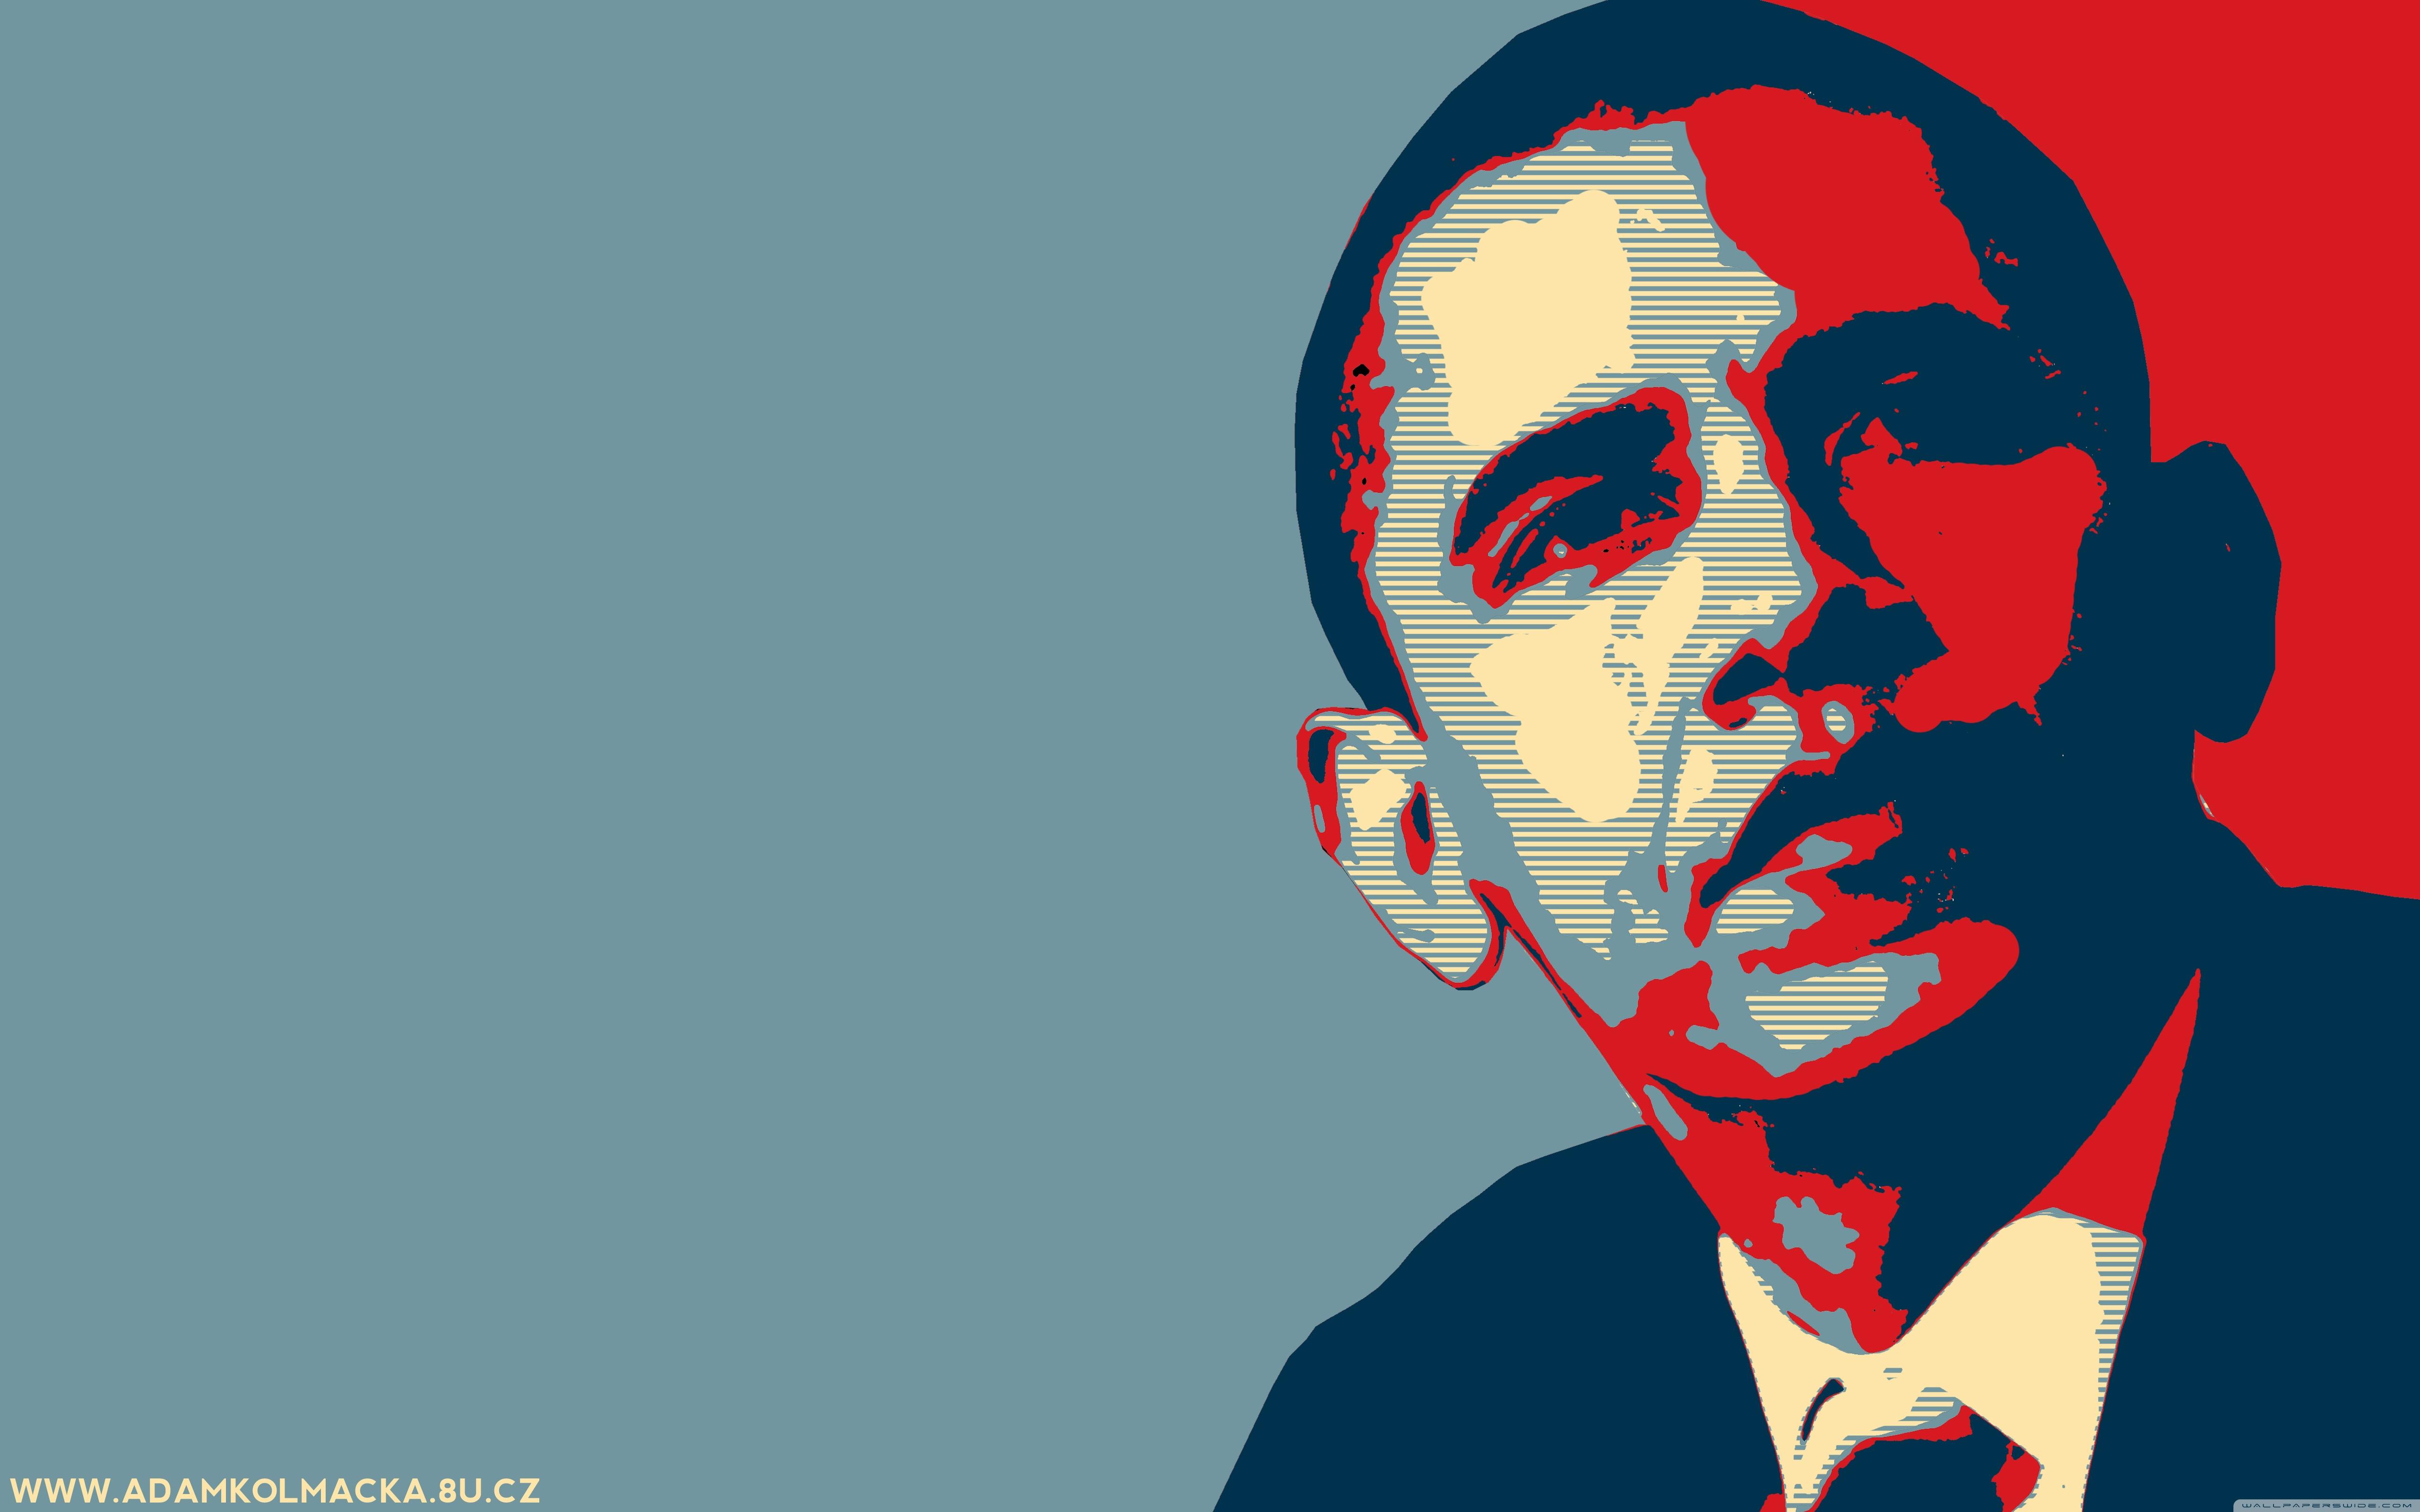 President Barack Obama Photo Wallpaper is a hi res Wallpaper 5120x3200